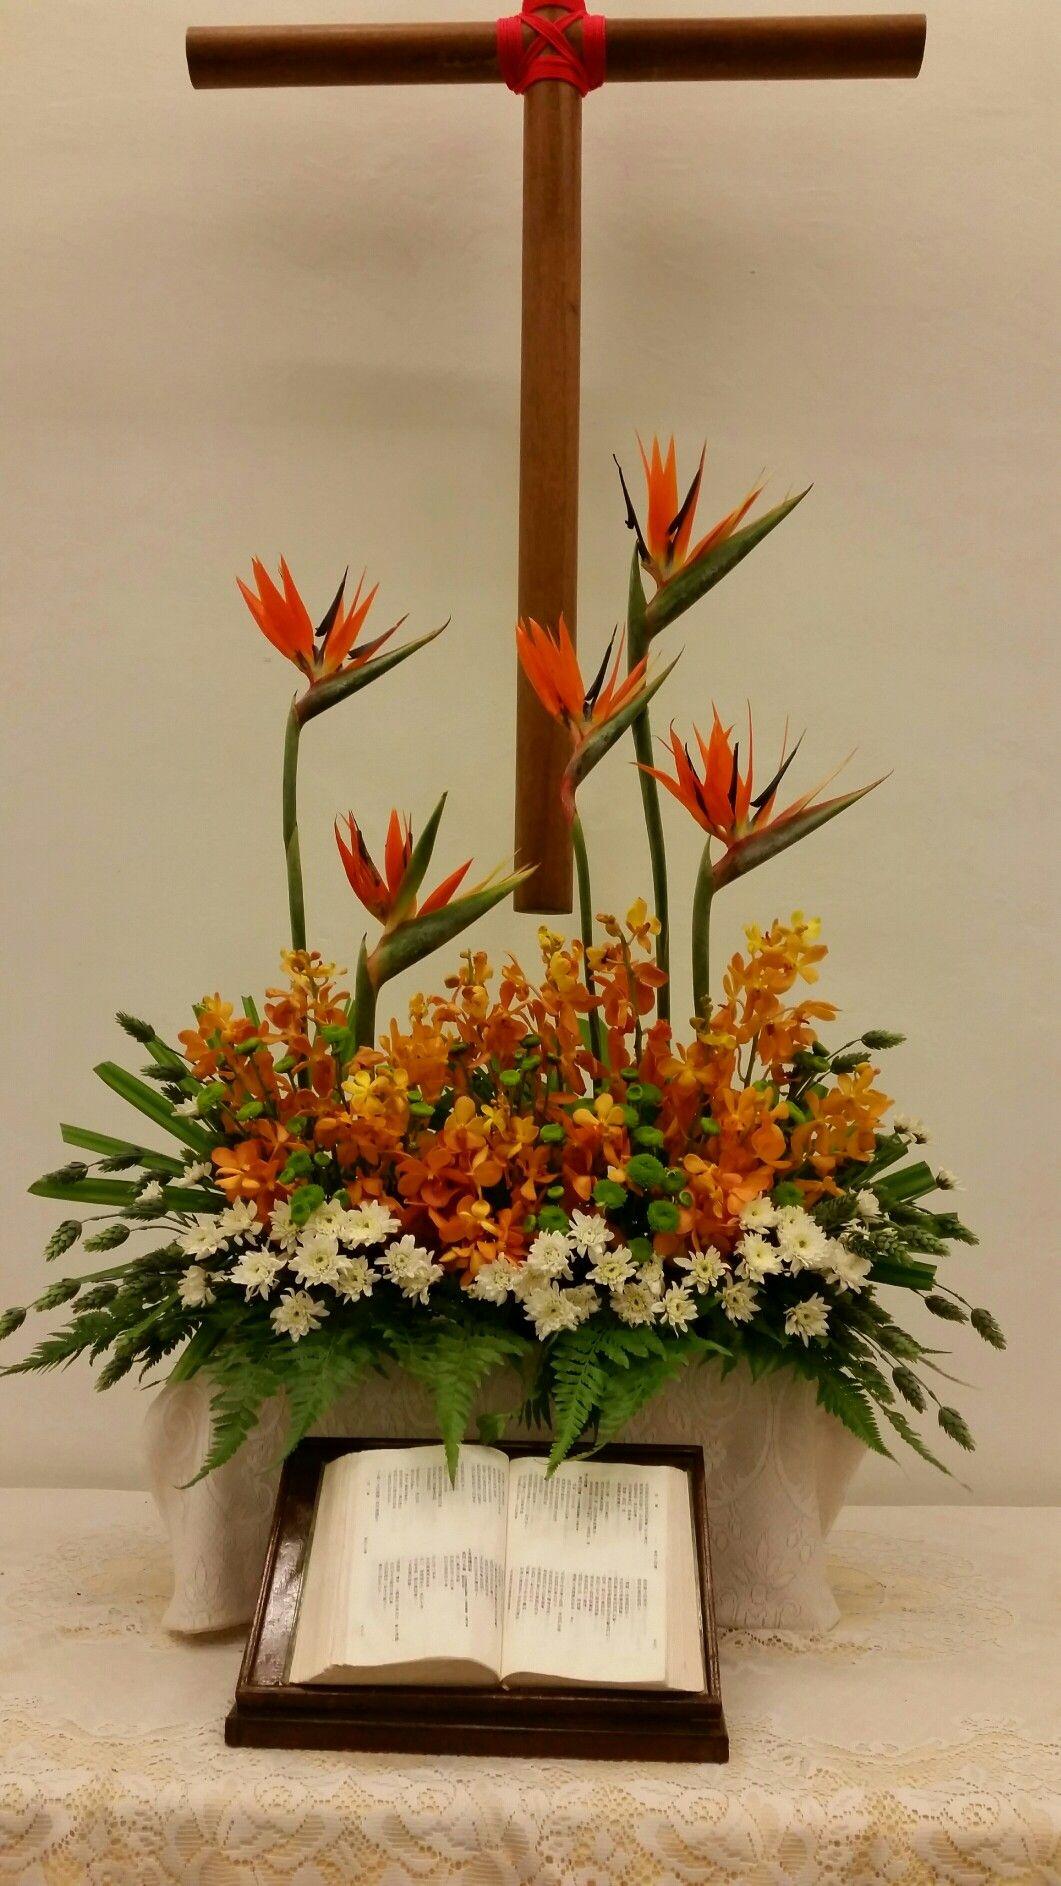 Chapel hall 2016 fresh flowers arrangements fall flower